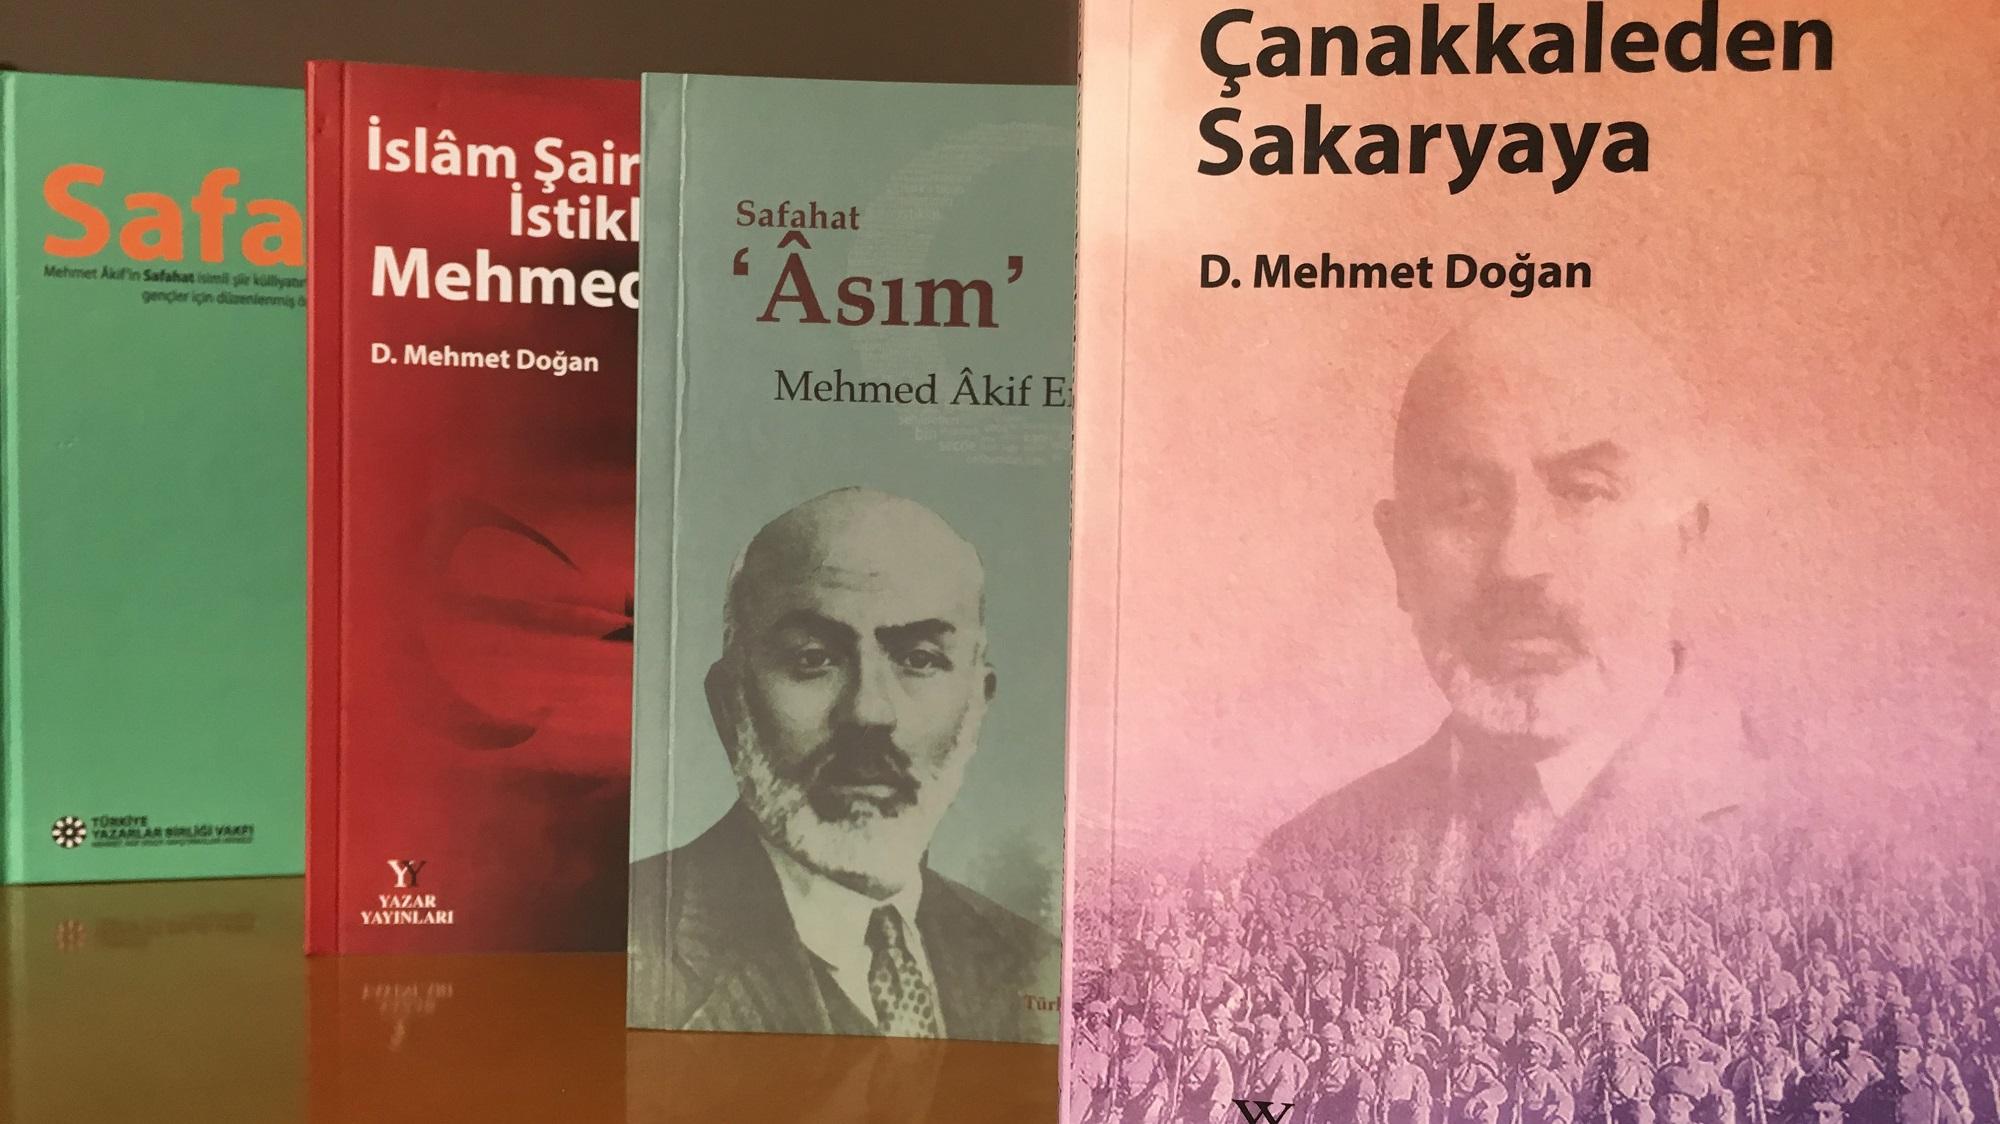 Mehmed Âkif Kitap Seti Kampanyası